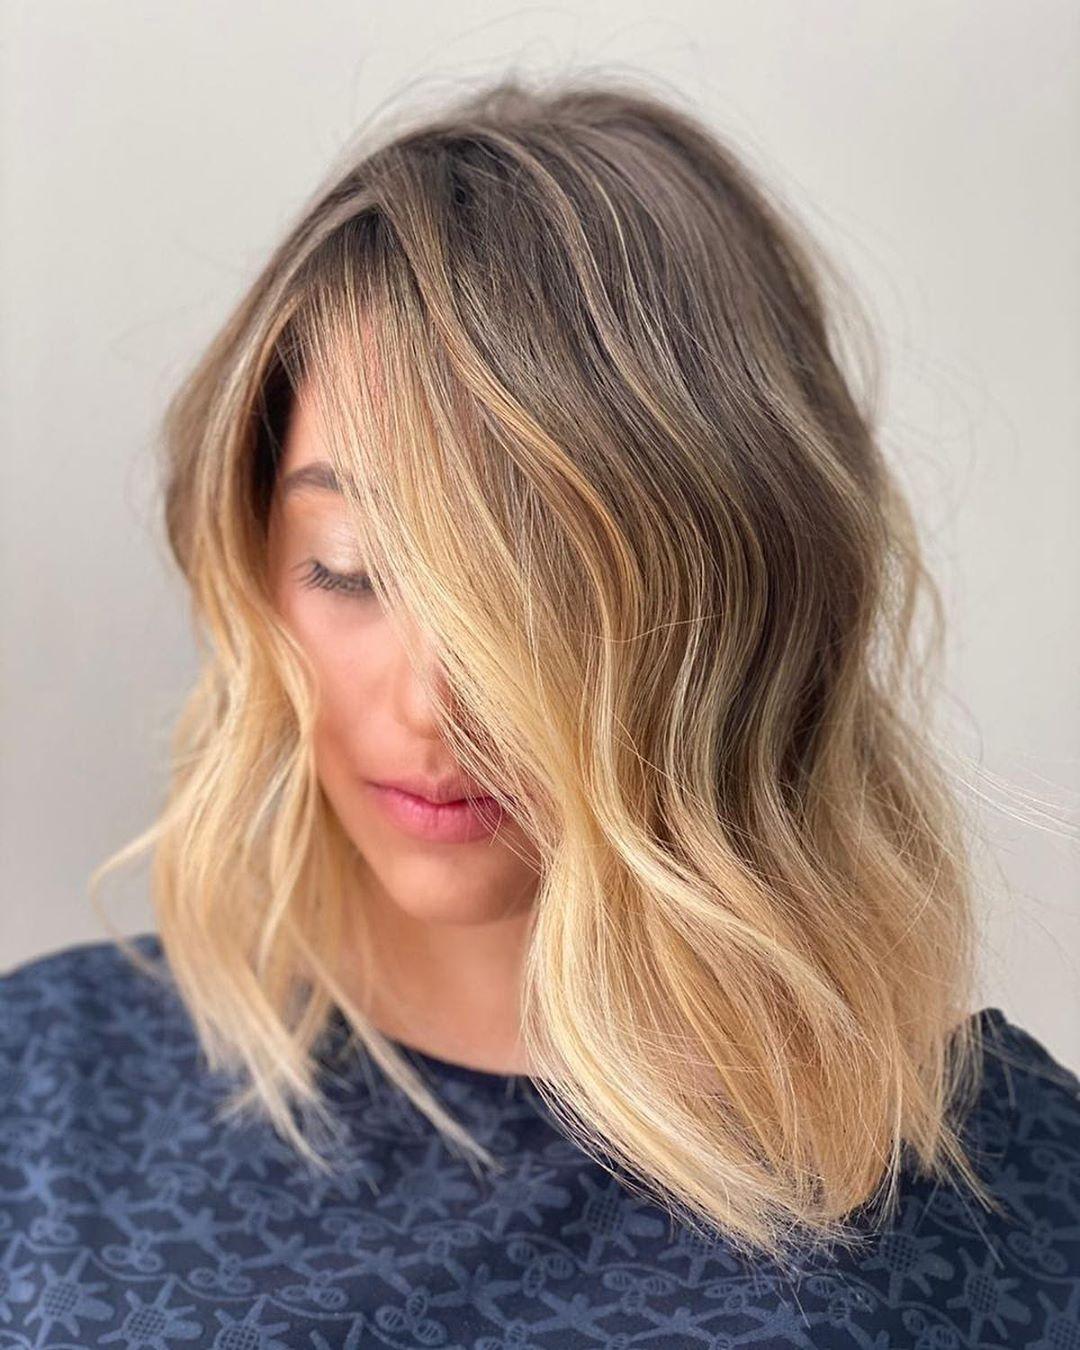 Medium Cut for Wavy Hair